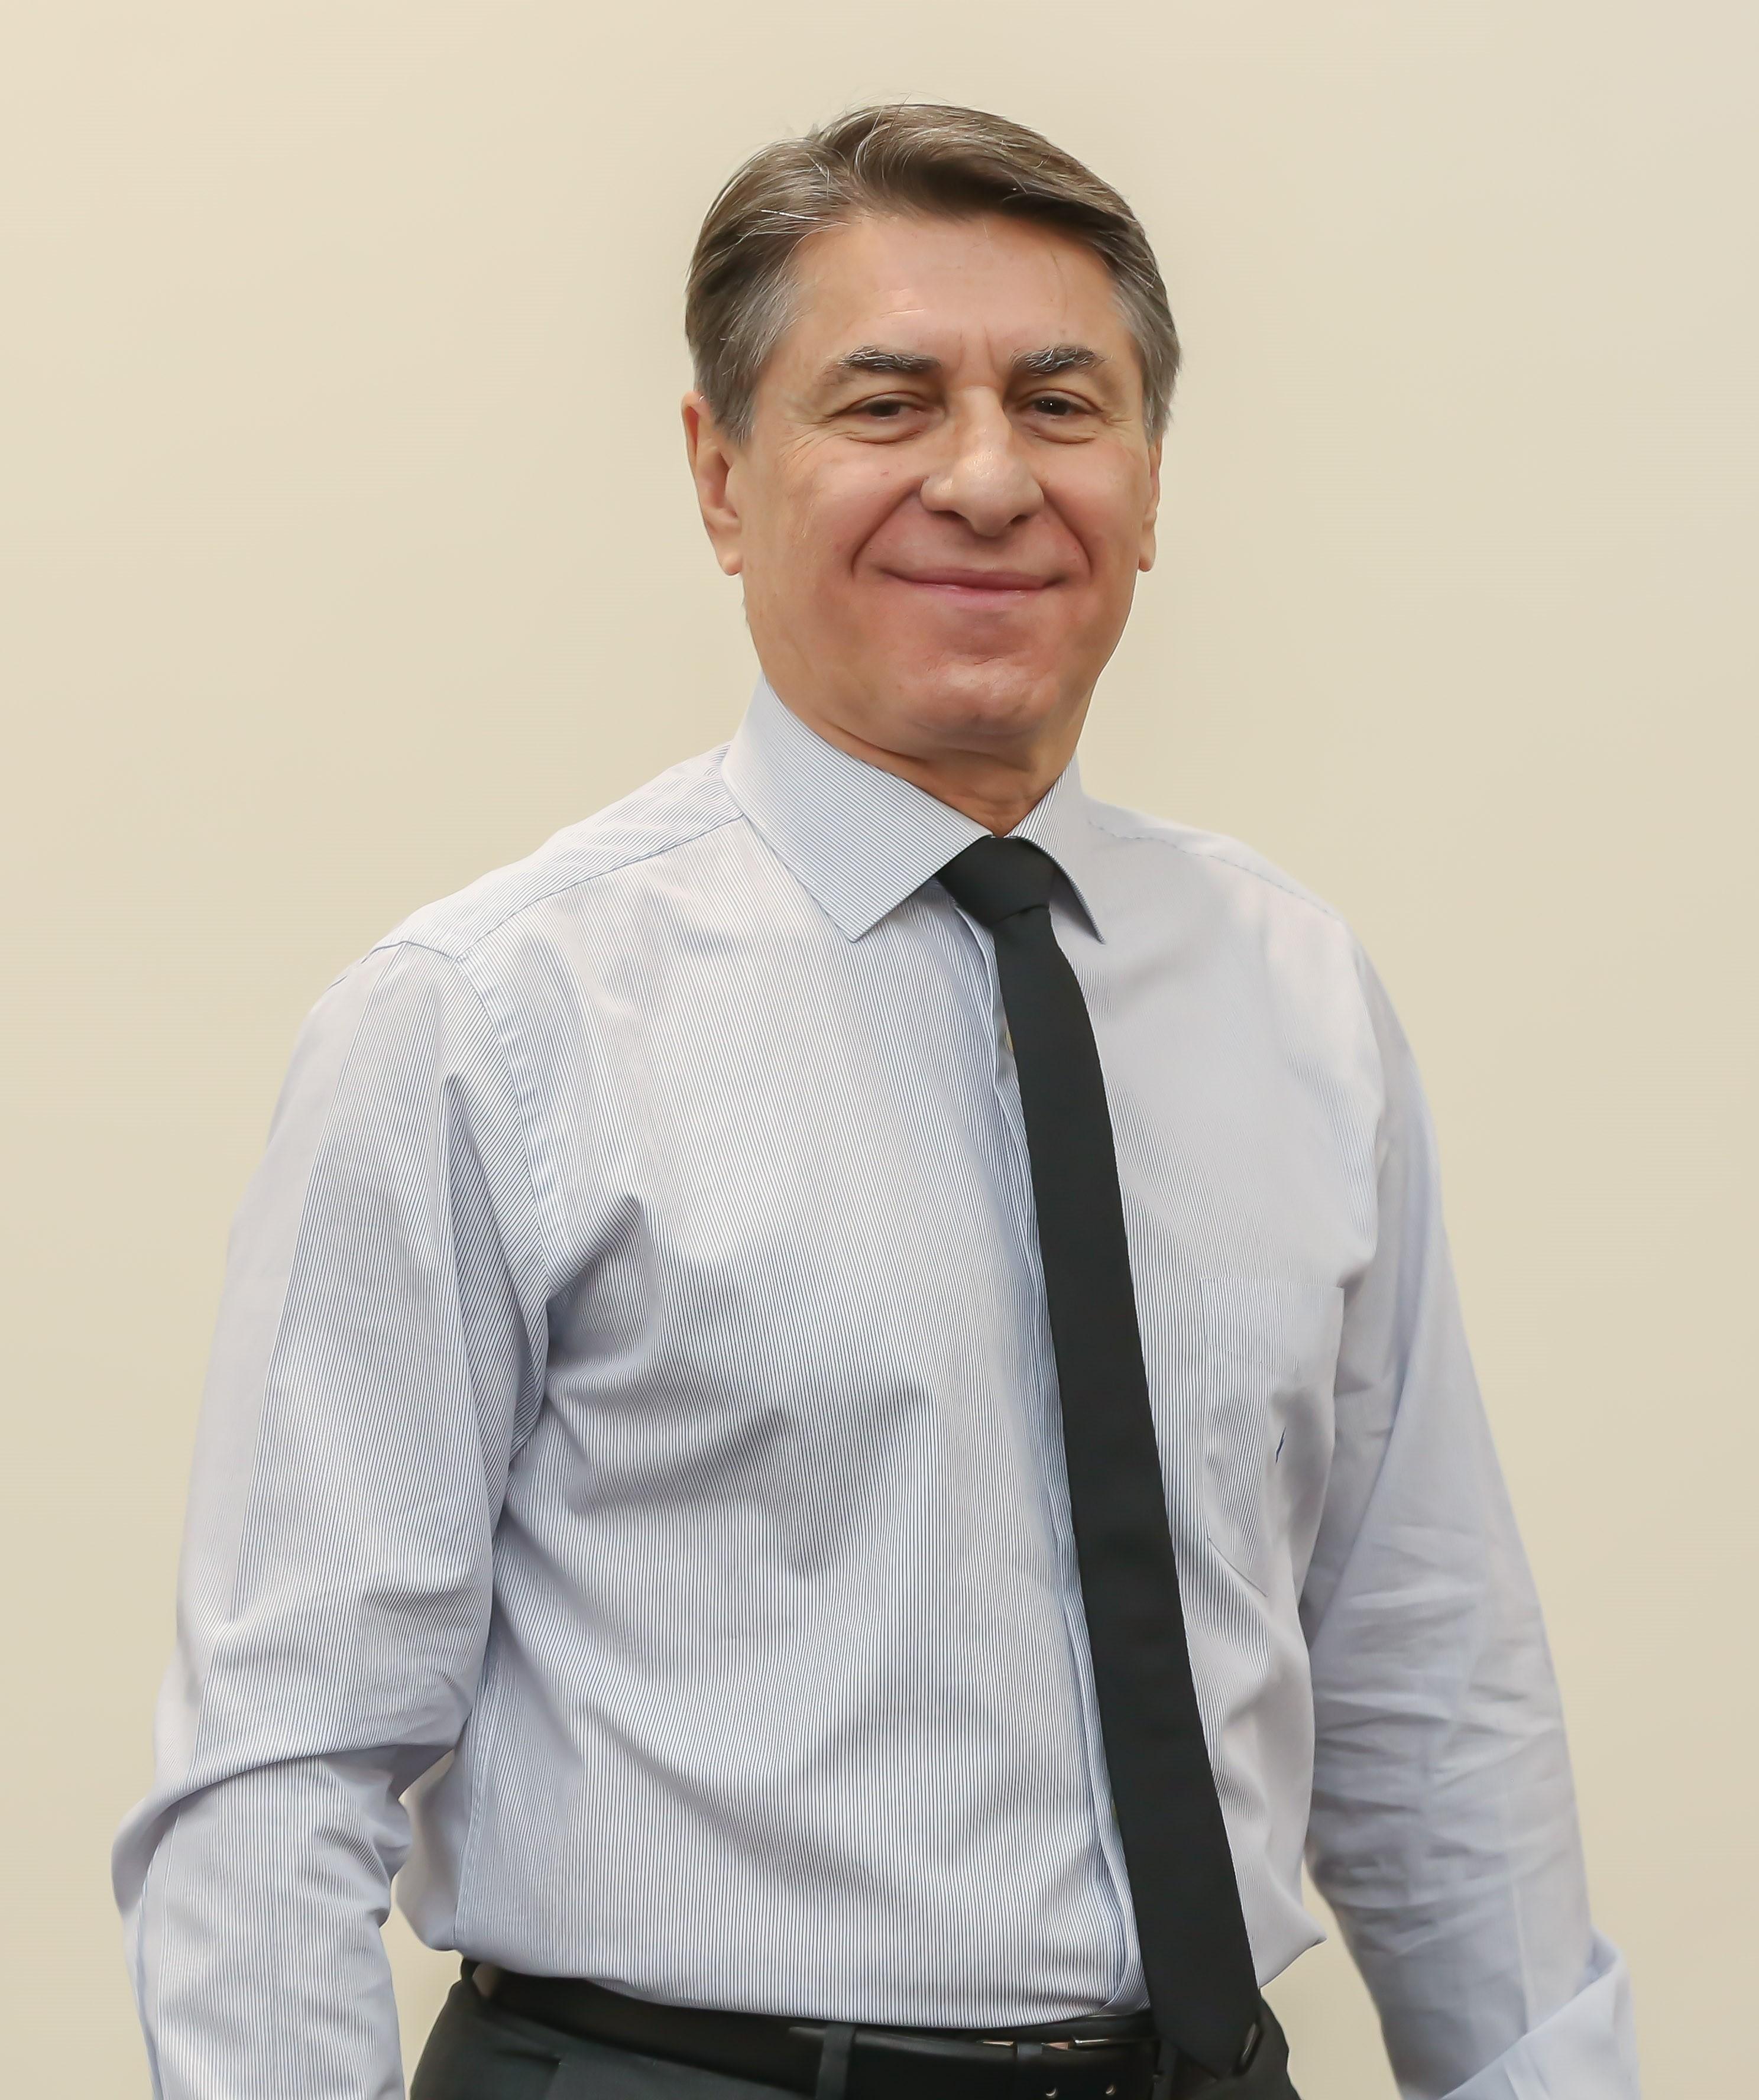 Dr. Paulo Faria, presidente da Unimed Paraná